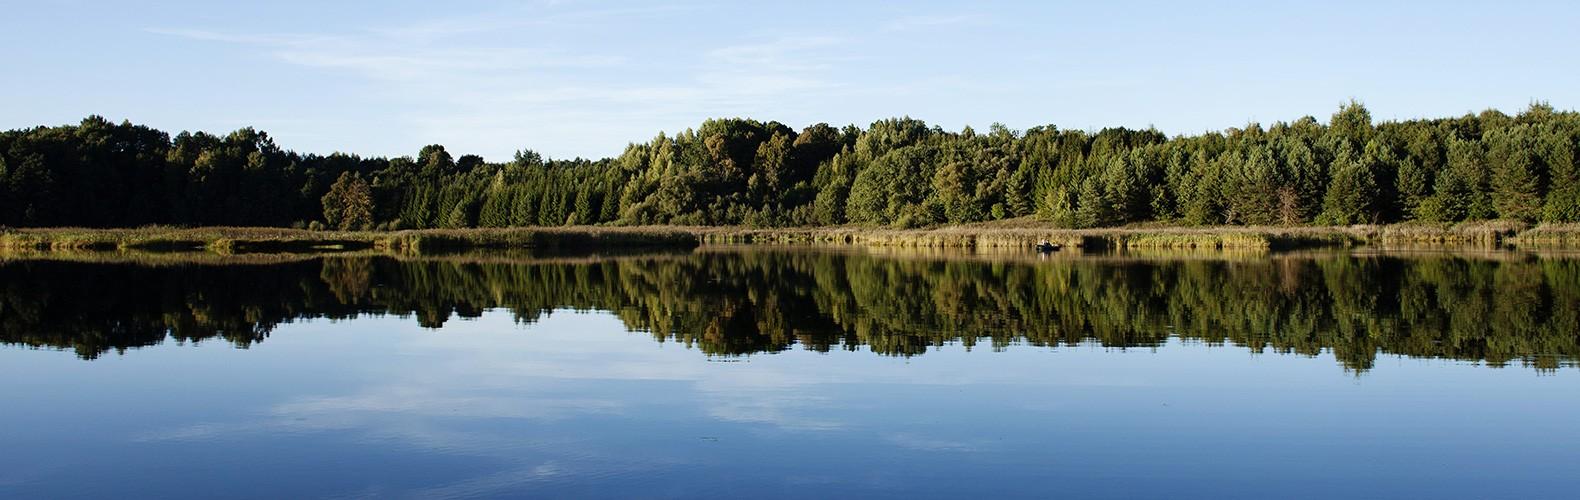 Ežeras - lauko pramogoms | Kernavės bajorynė